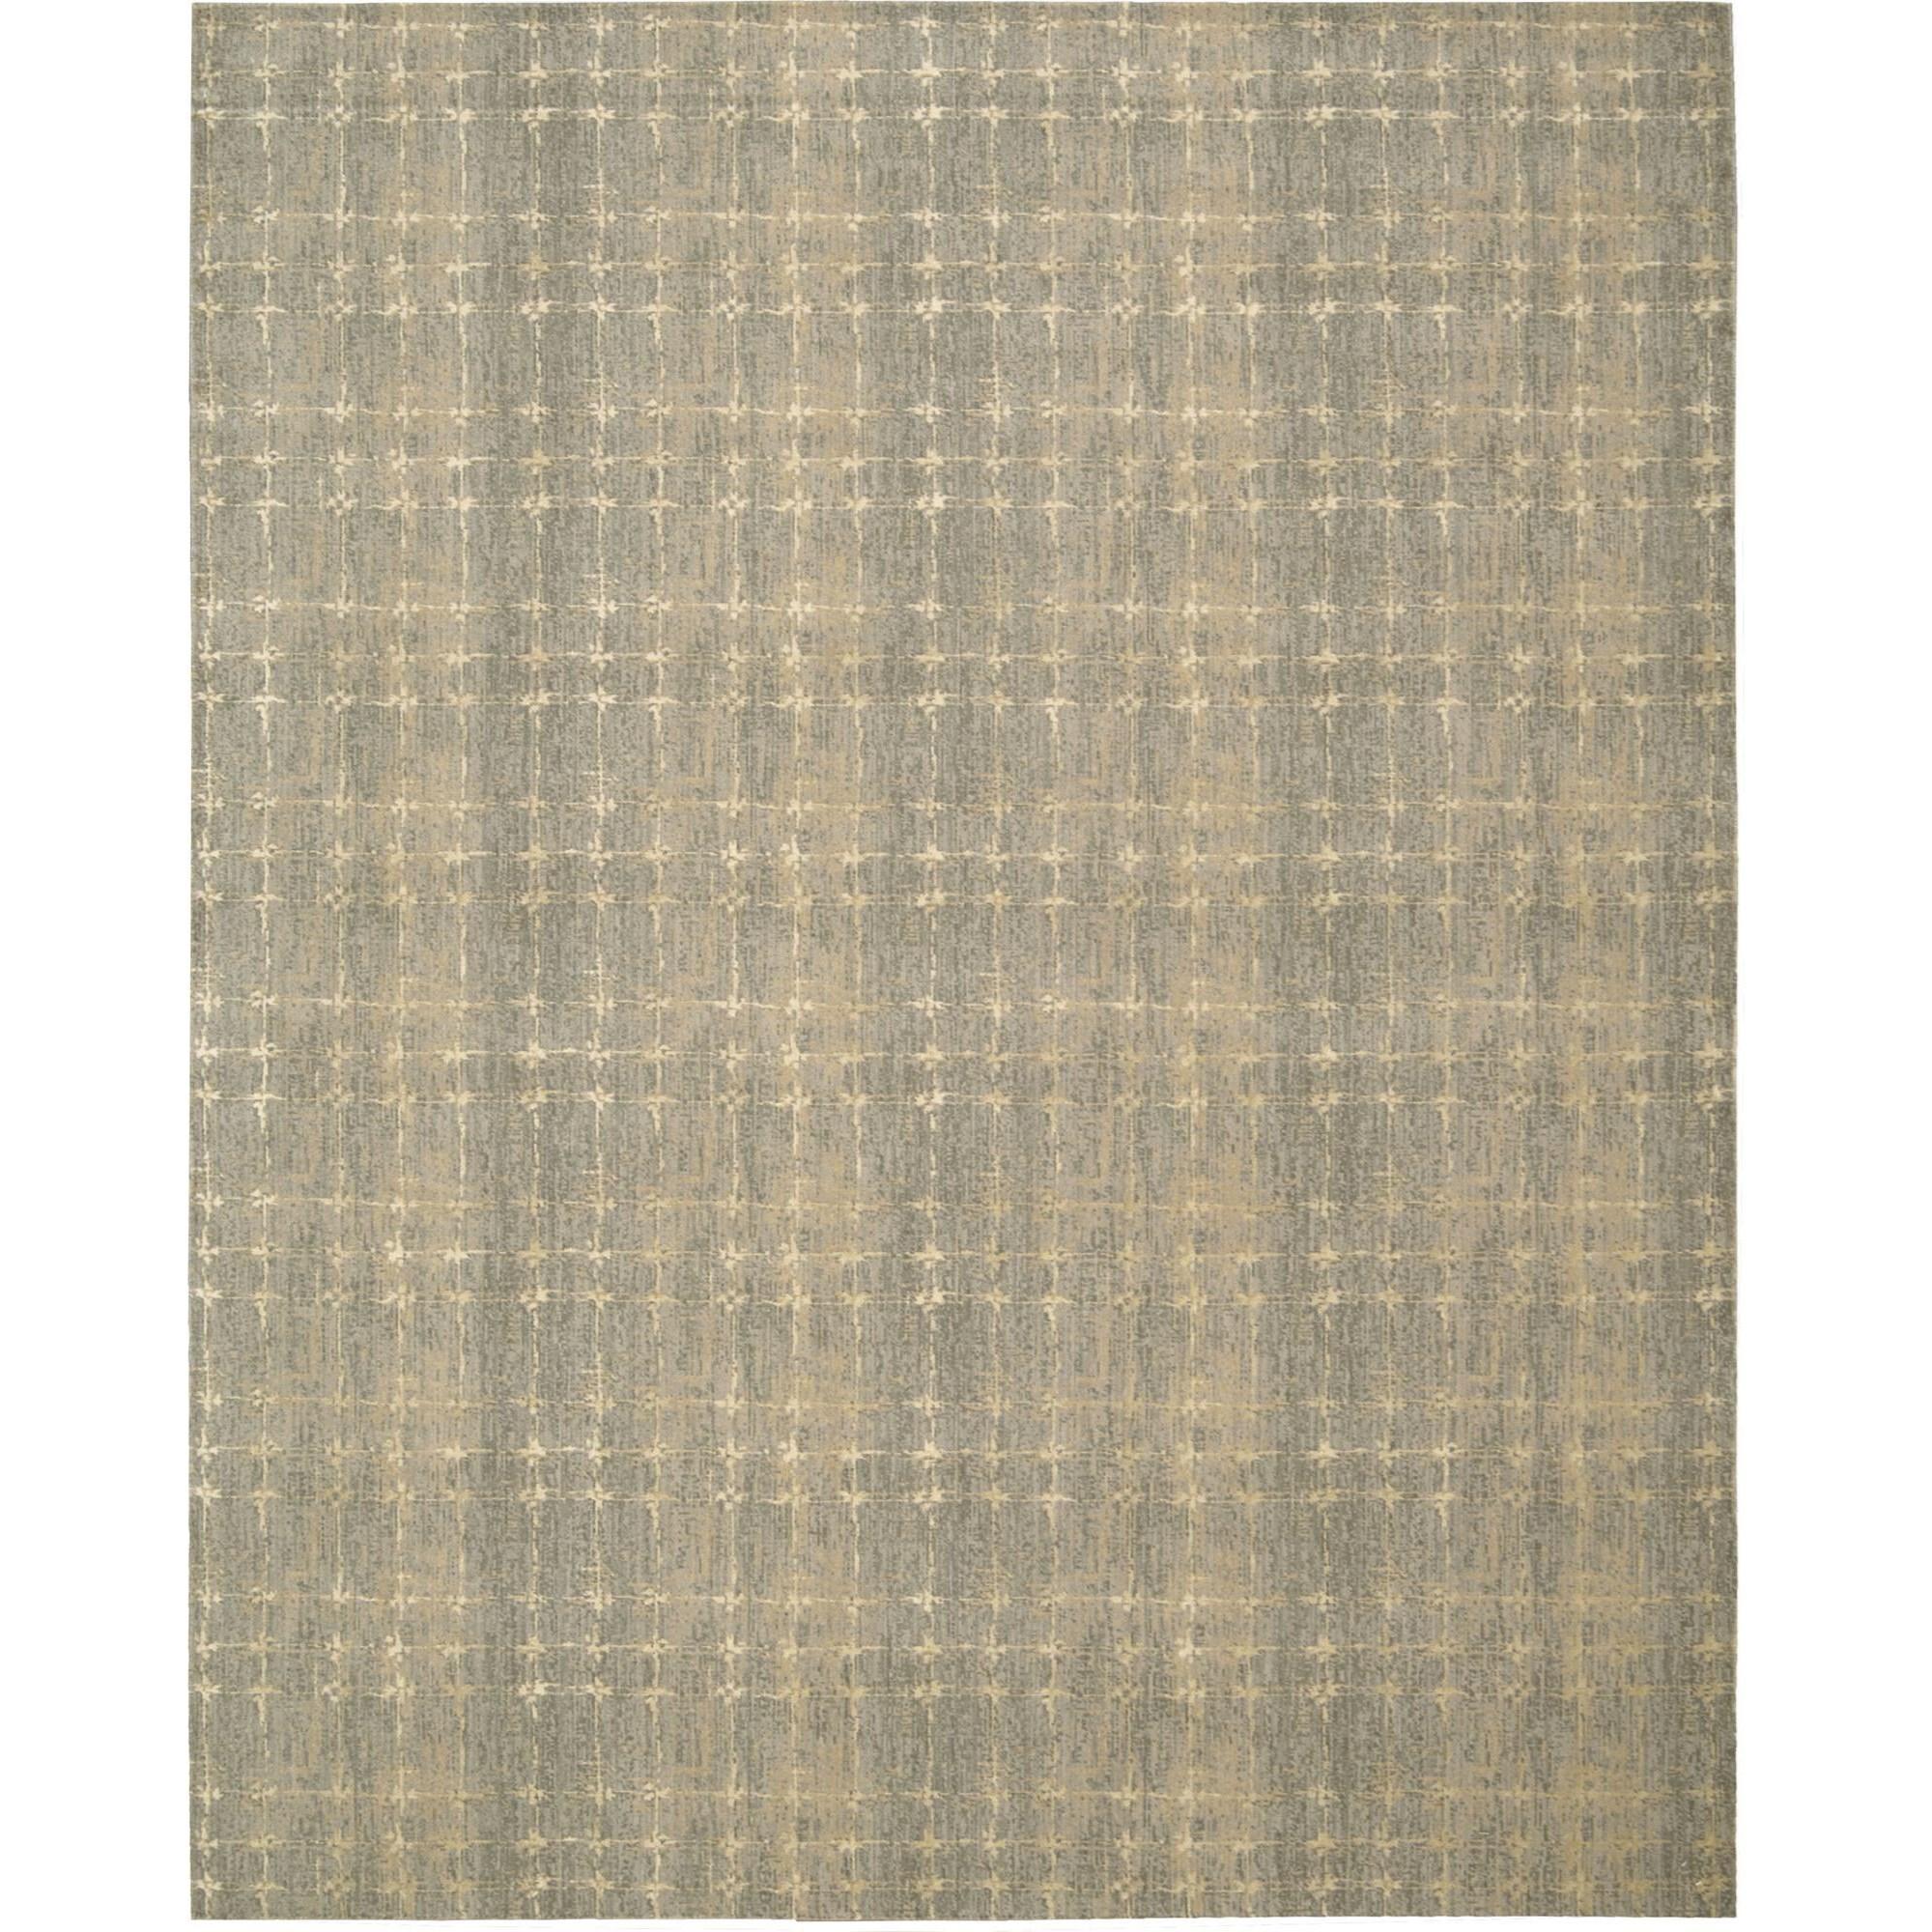 "Nourison Silken Allure 5'6"" x 8' Grey Area Rug - Item Number: 15263"